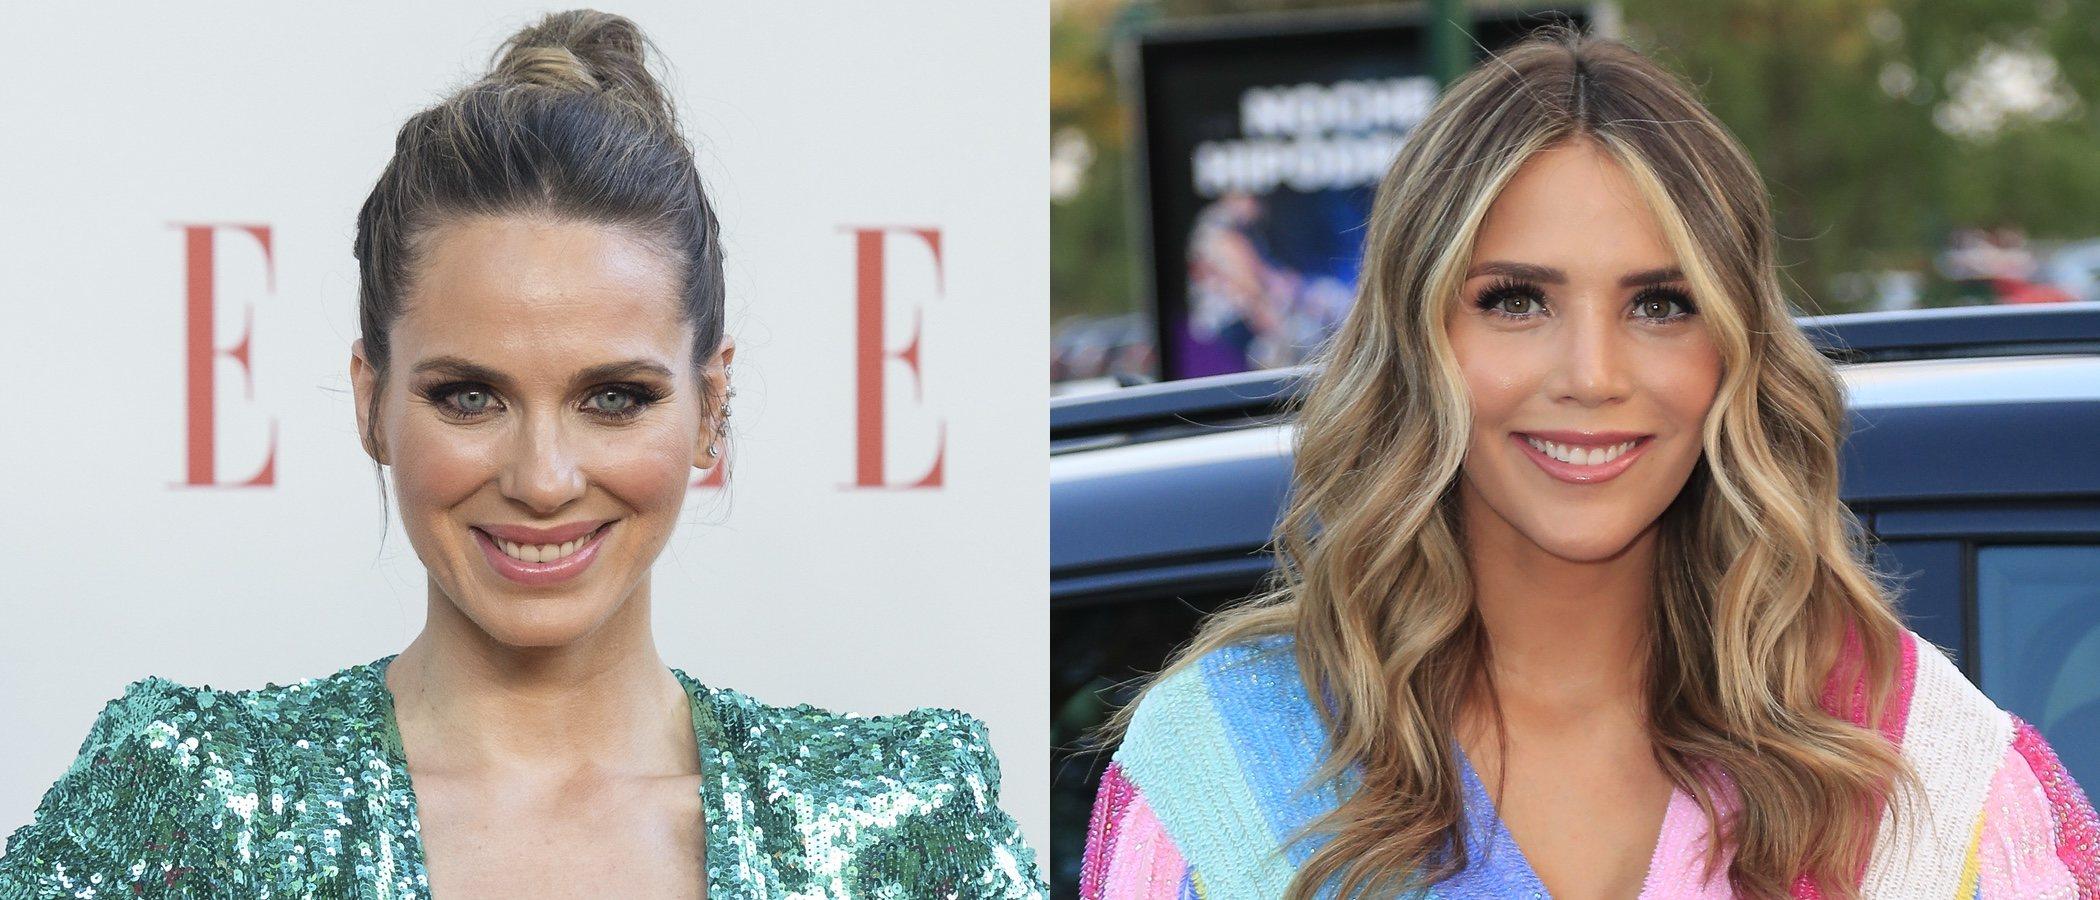 Vanesa Romero y Rosanna Zanetti, entre los mejores beauty looks de la semana